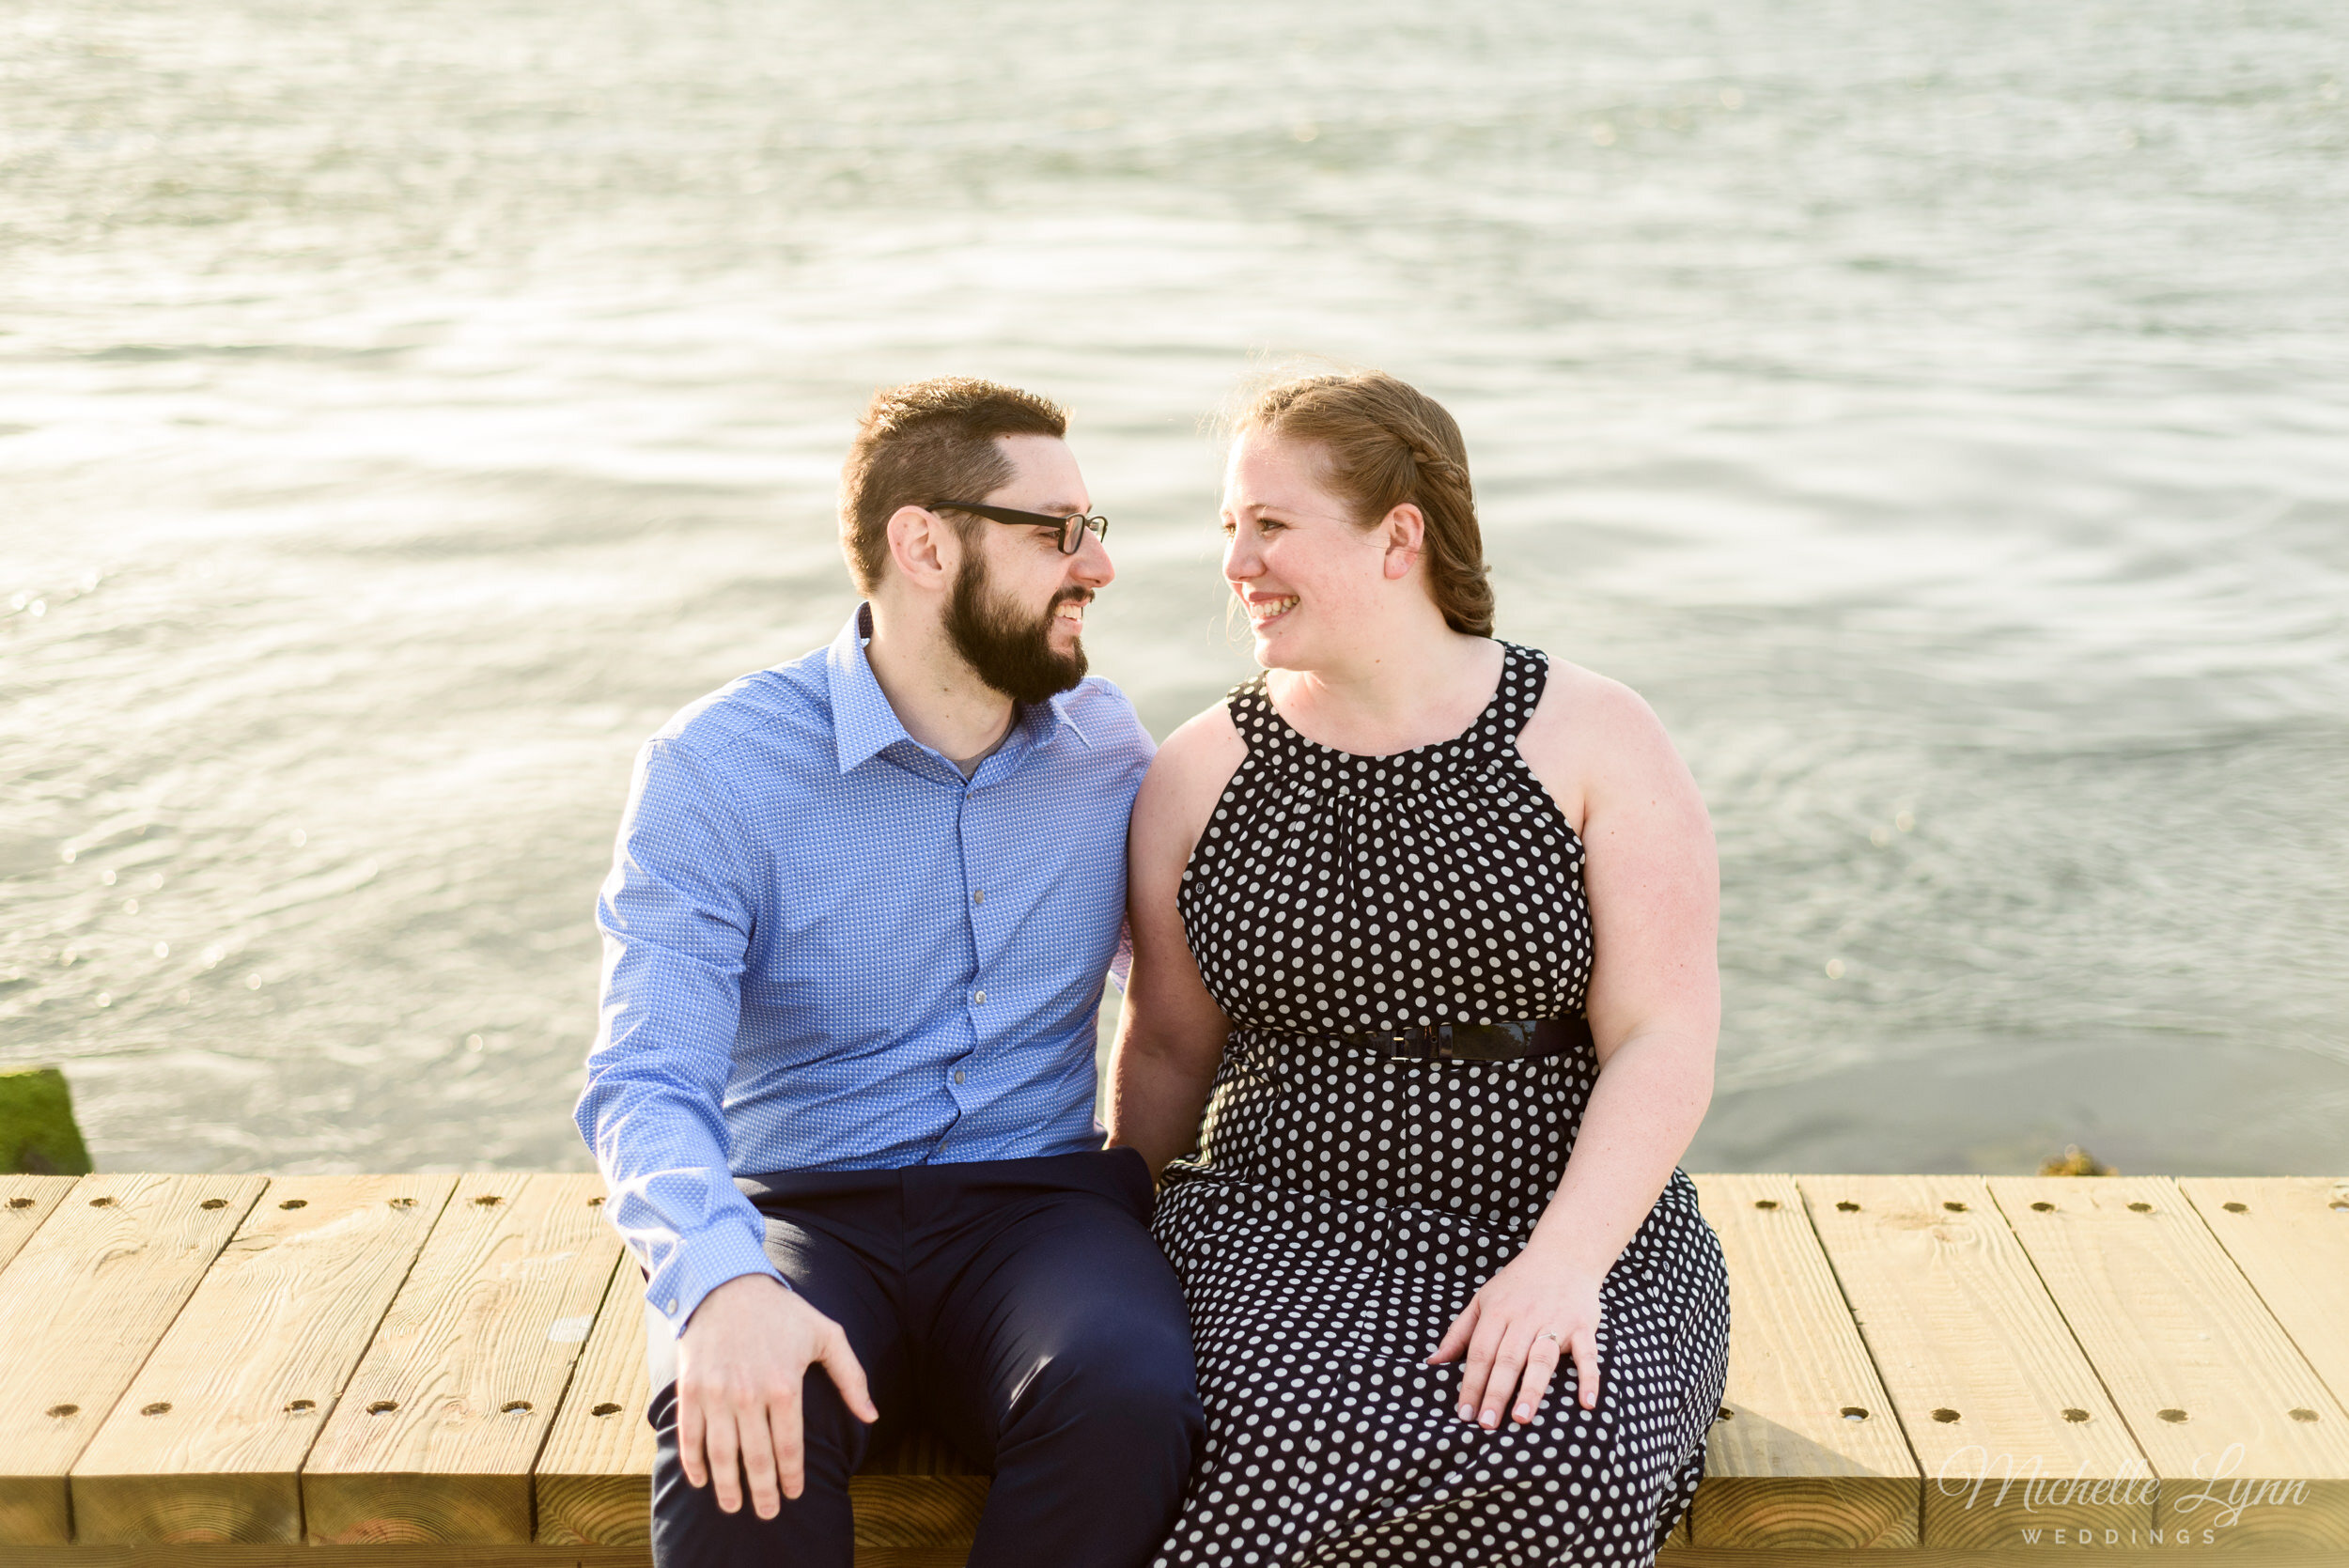 barnegat-lighthouse-engagement-photos-michelle-lynn-weddings-12.jpg